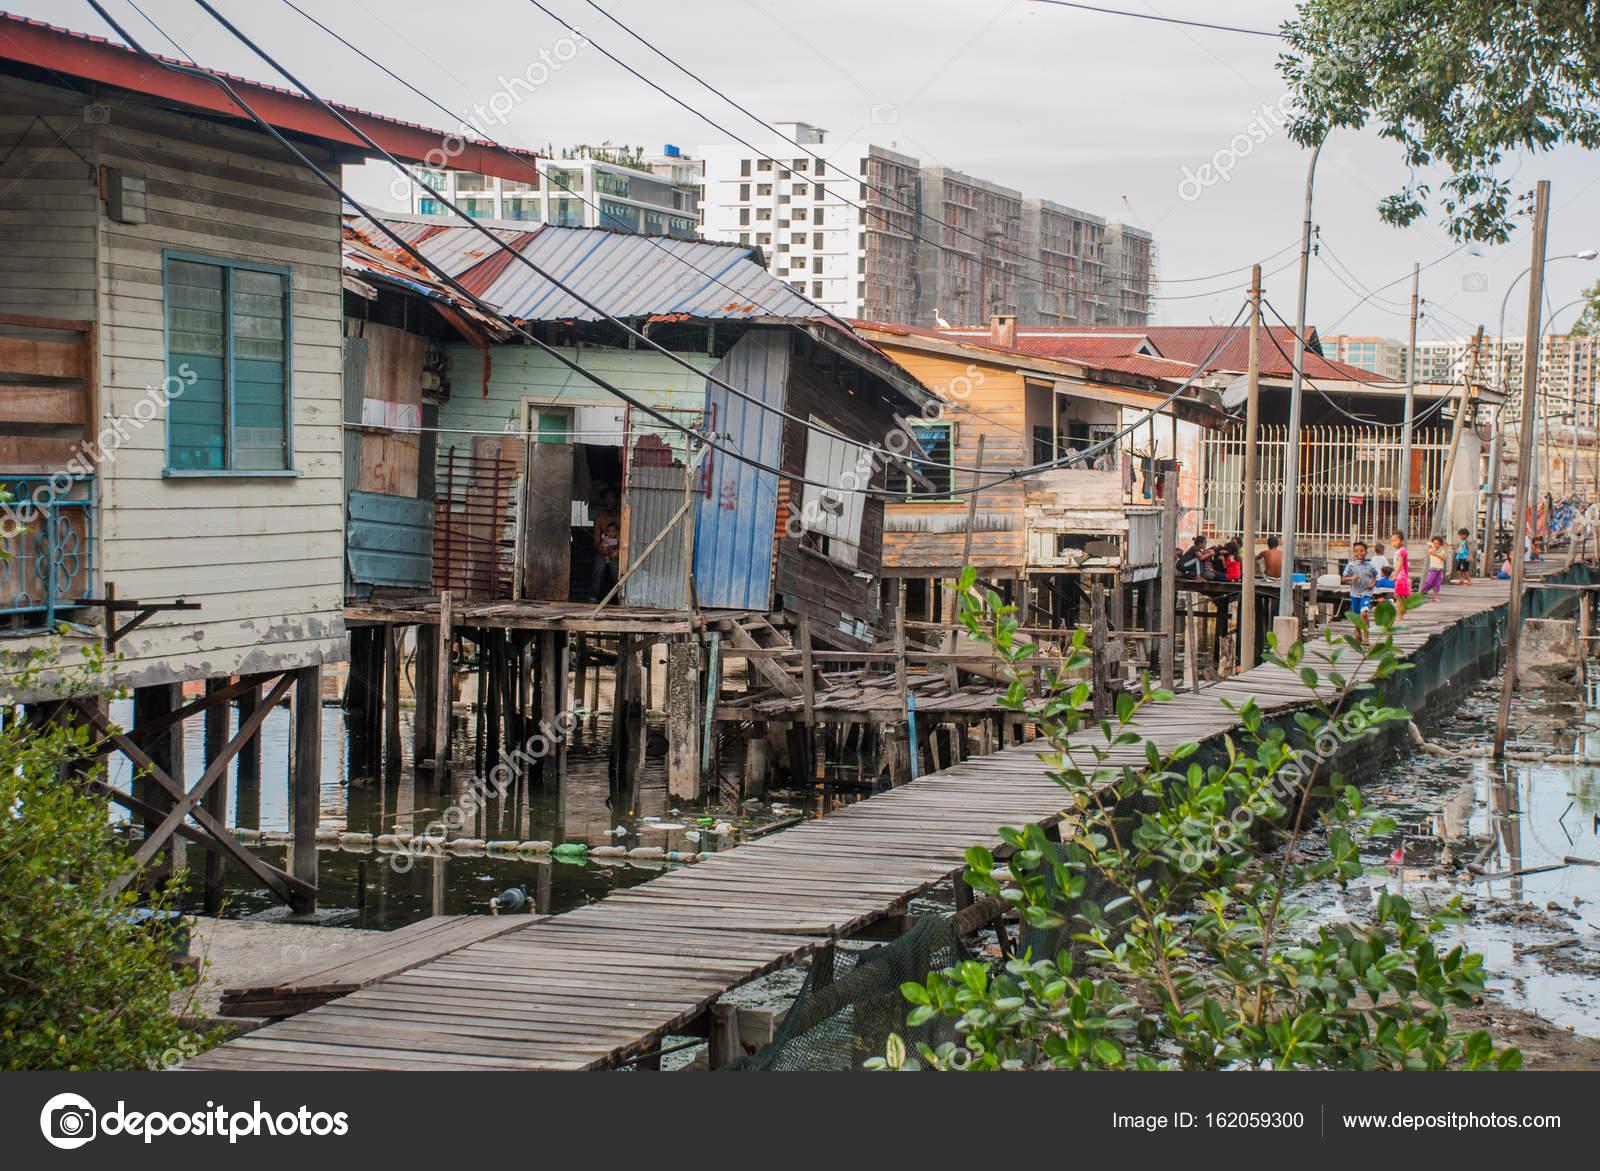 Häuser Auf Stelzen Kota Kinabalu Sabah Malaysia Redaktionelles